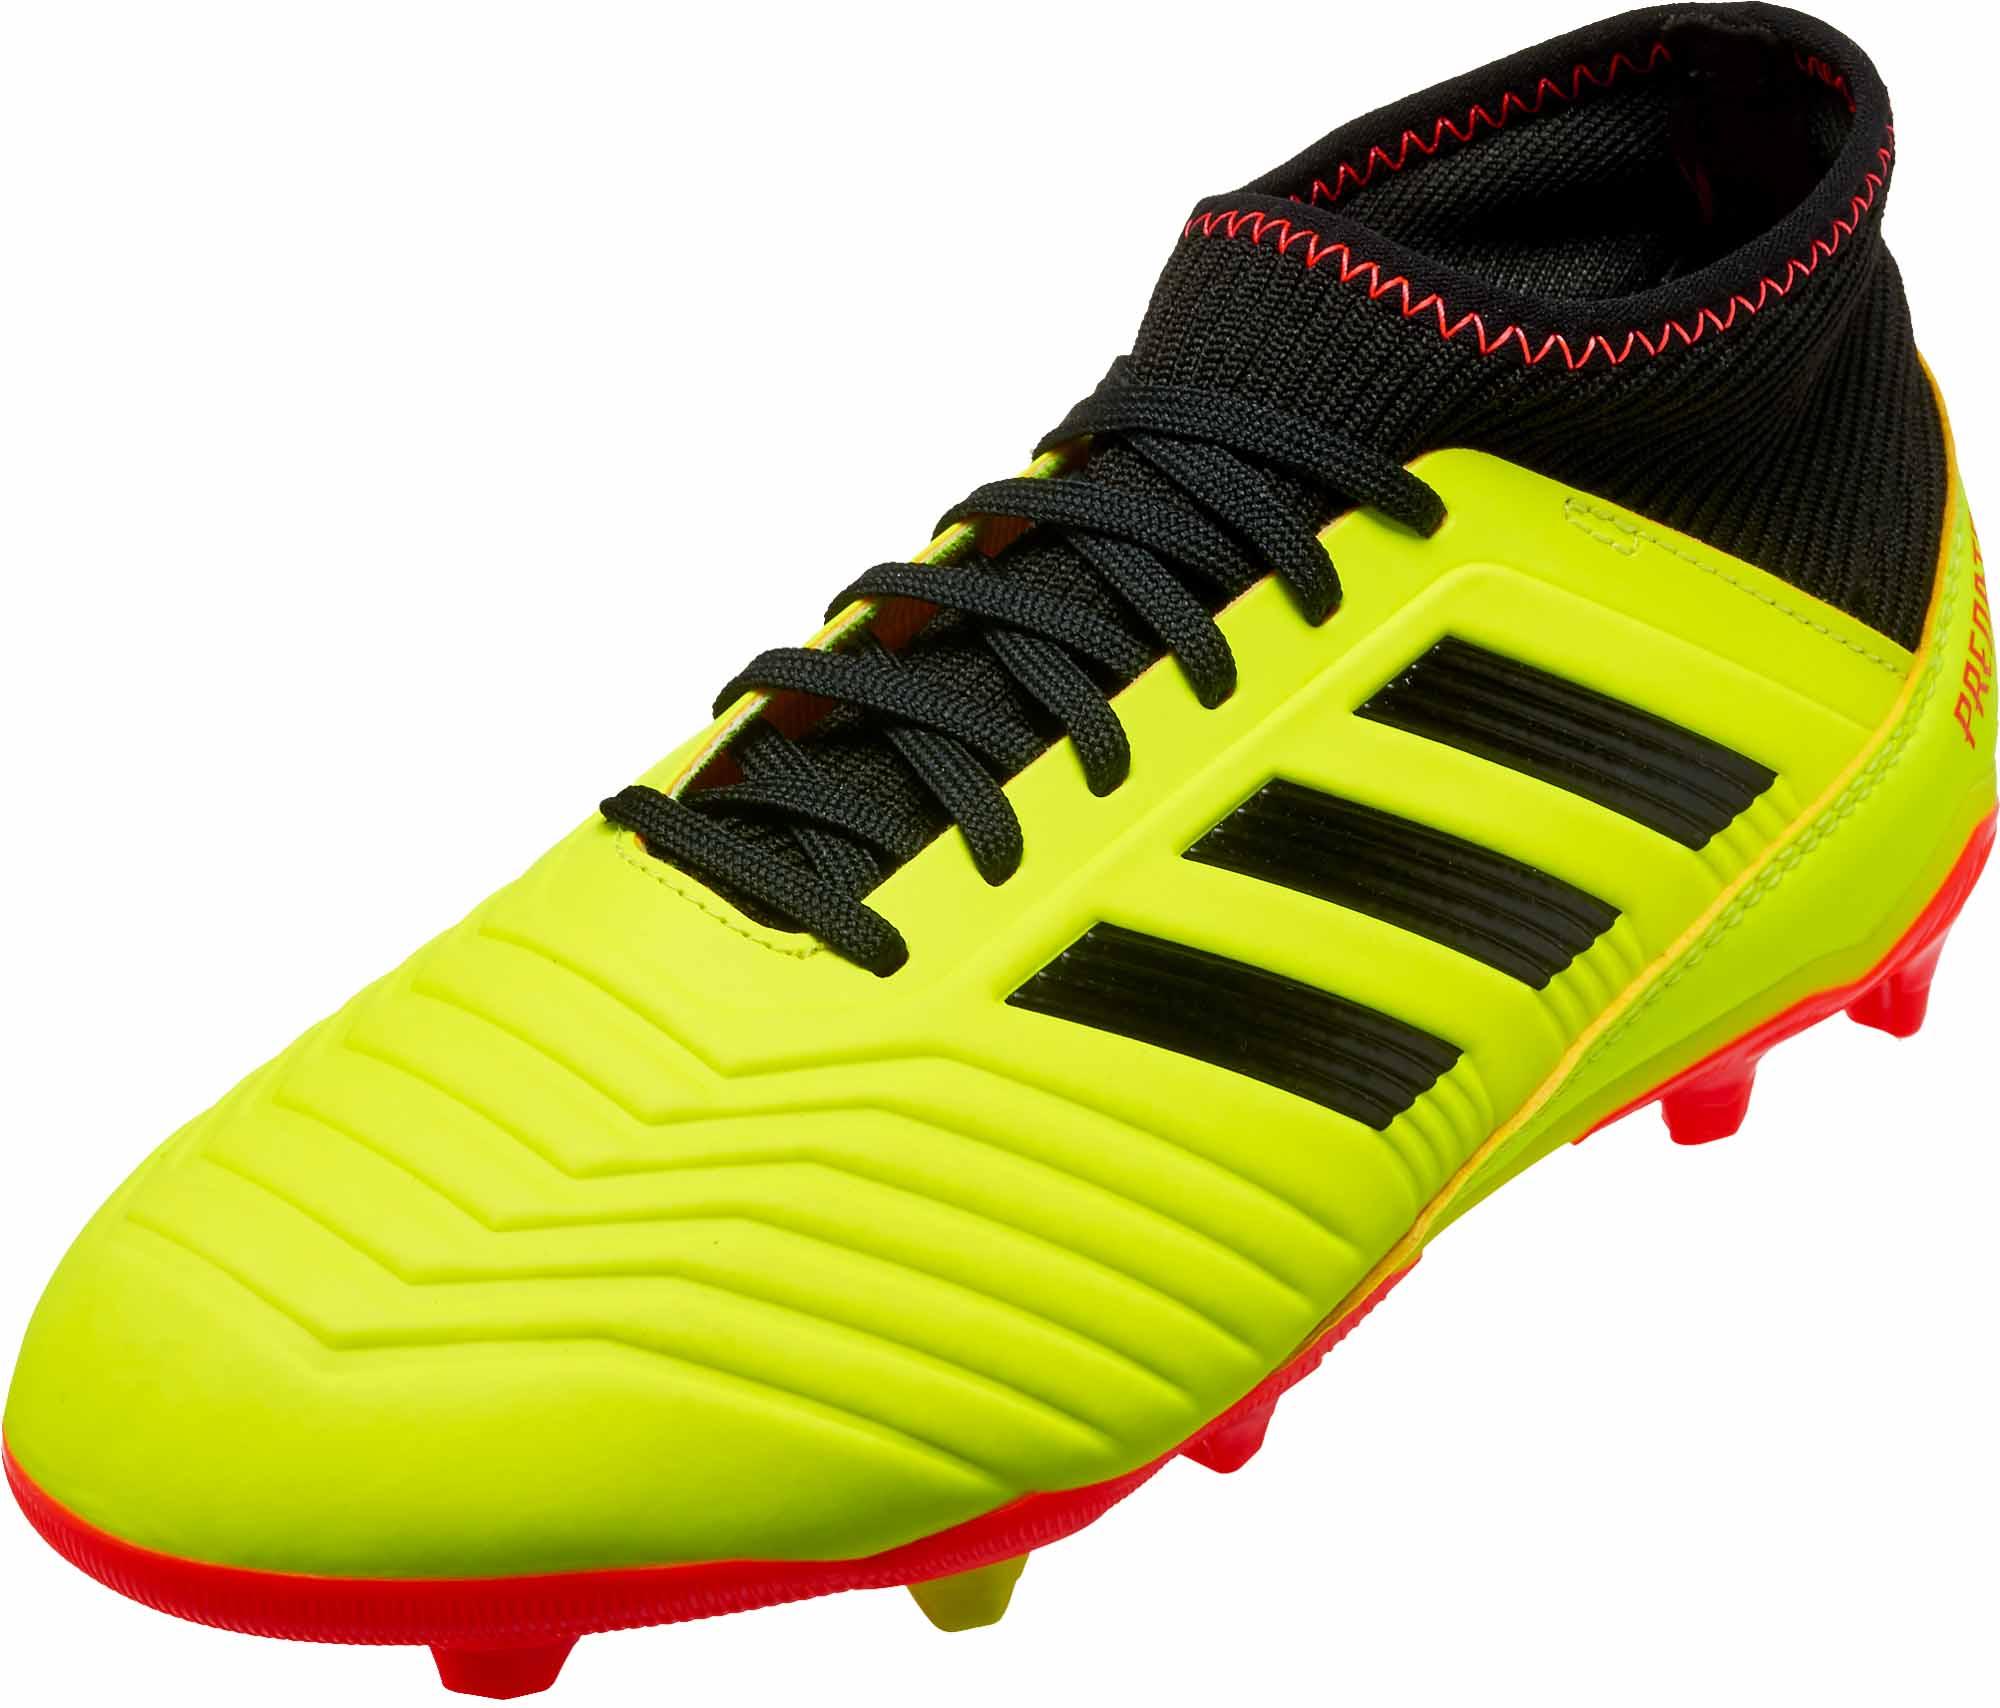 e6aa5f361c7f adidas Predator 18.3 FG - Youth - Solar Yellow Black Solar Red